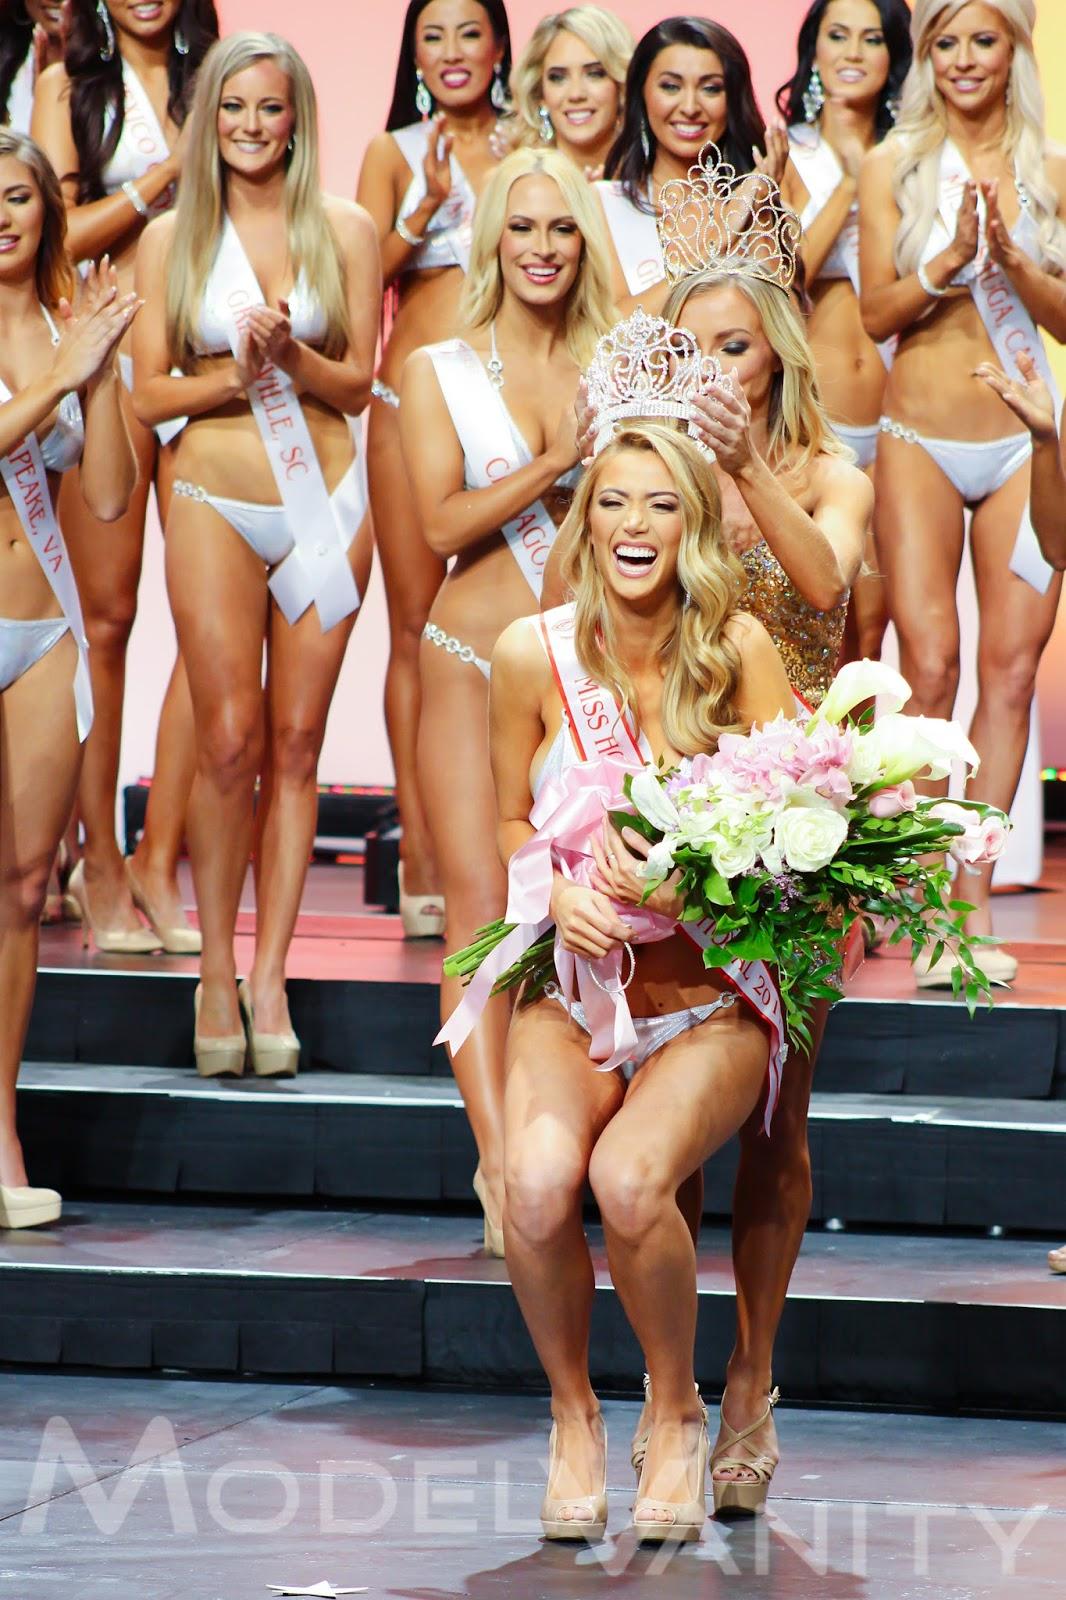 Hooters bikini contest tips